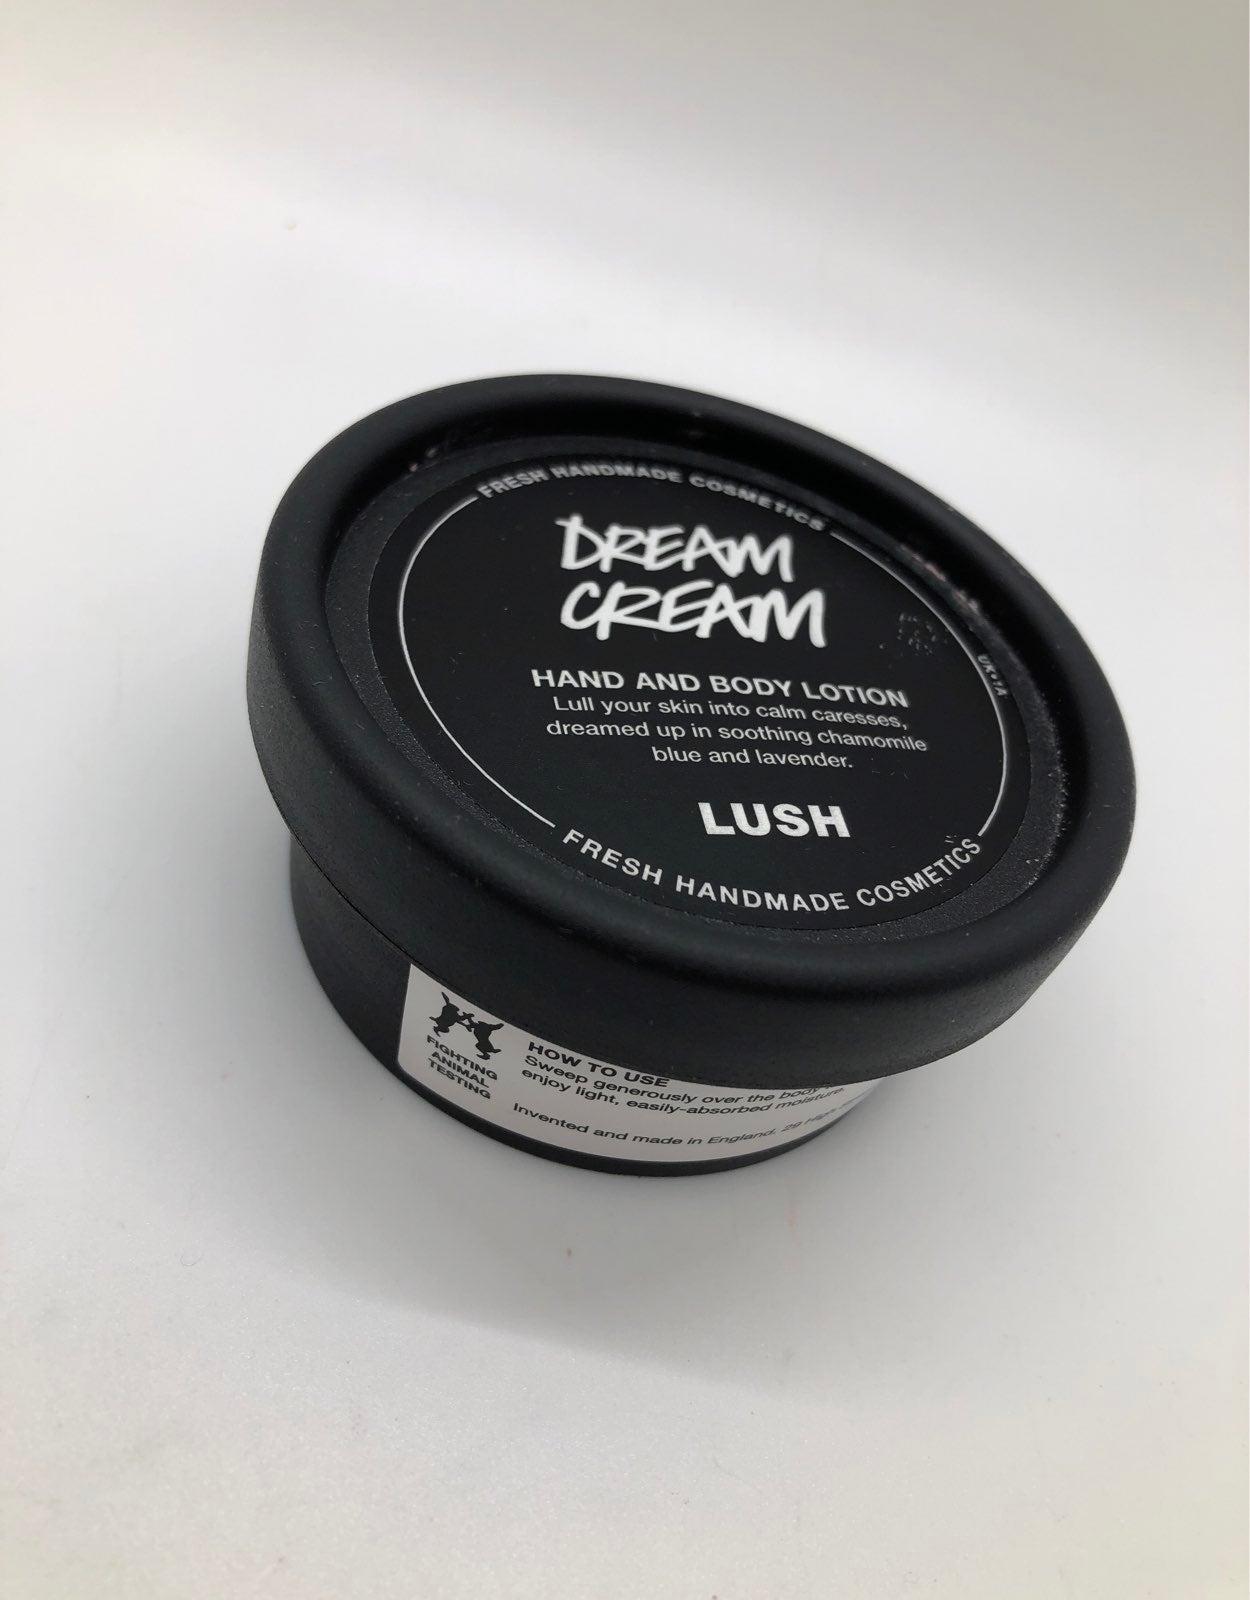 LUSH cosmetics Dream Cream Body Lotion